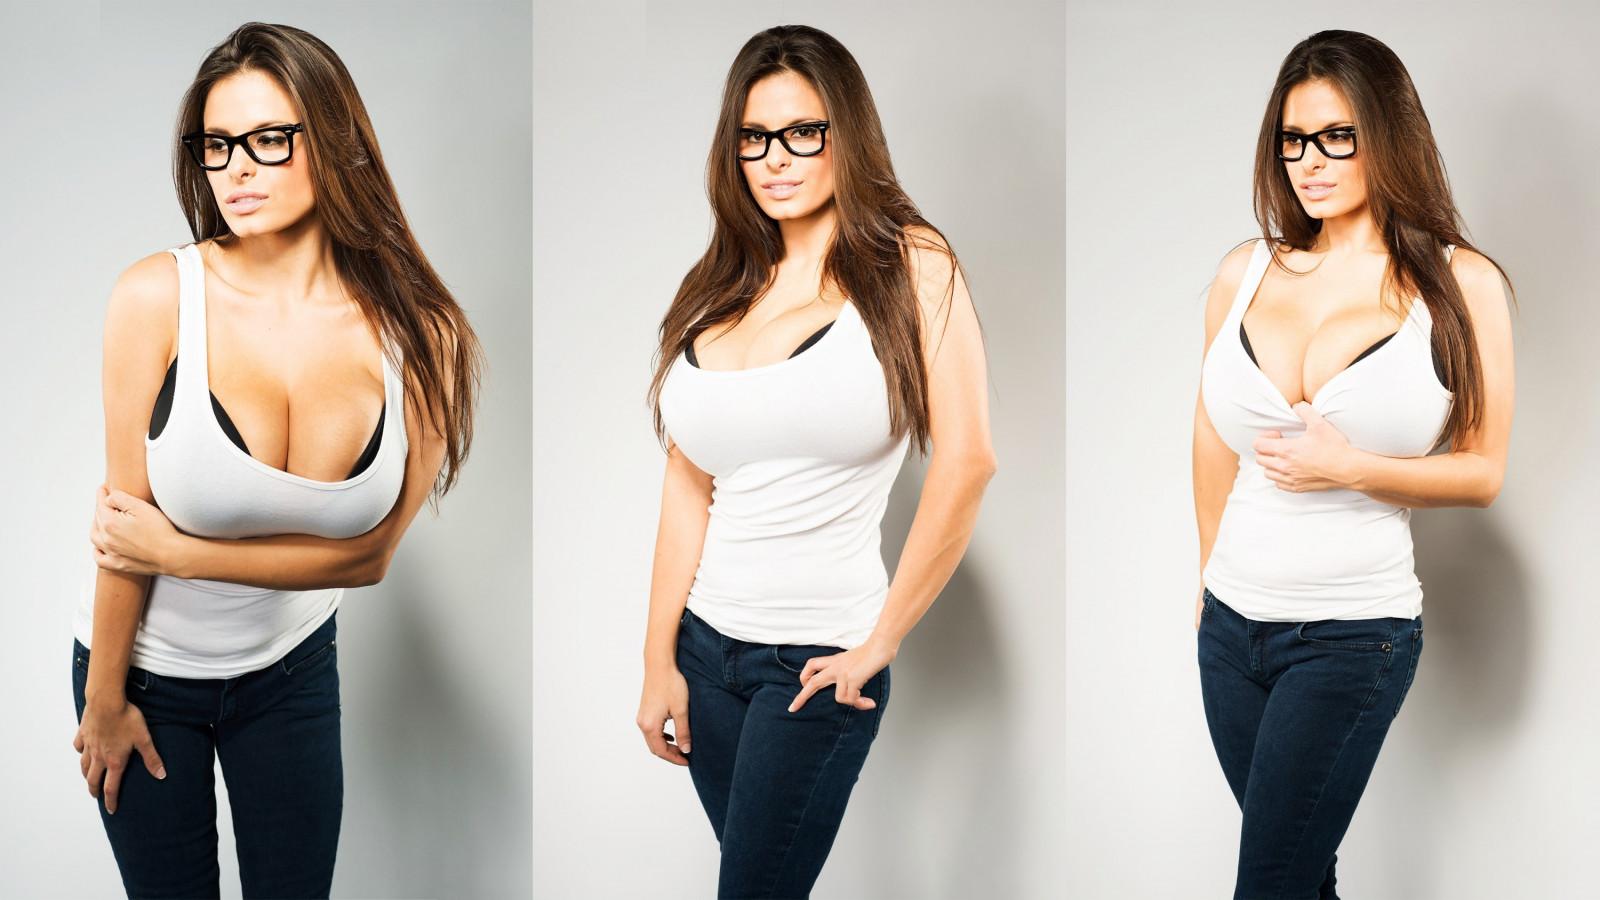 Brunette Women Wendy Fiore Glasses Jeans White Tops Women With Glasses Long Hair White Background Black